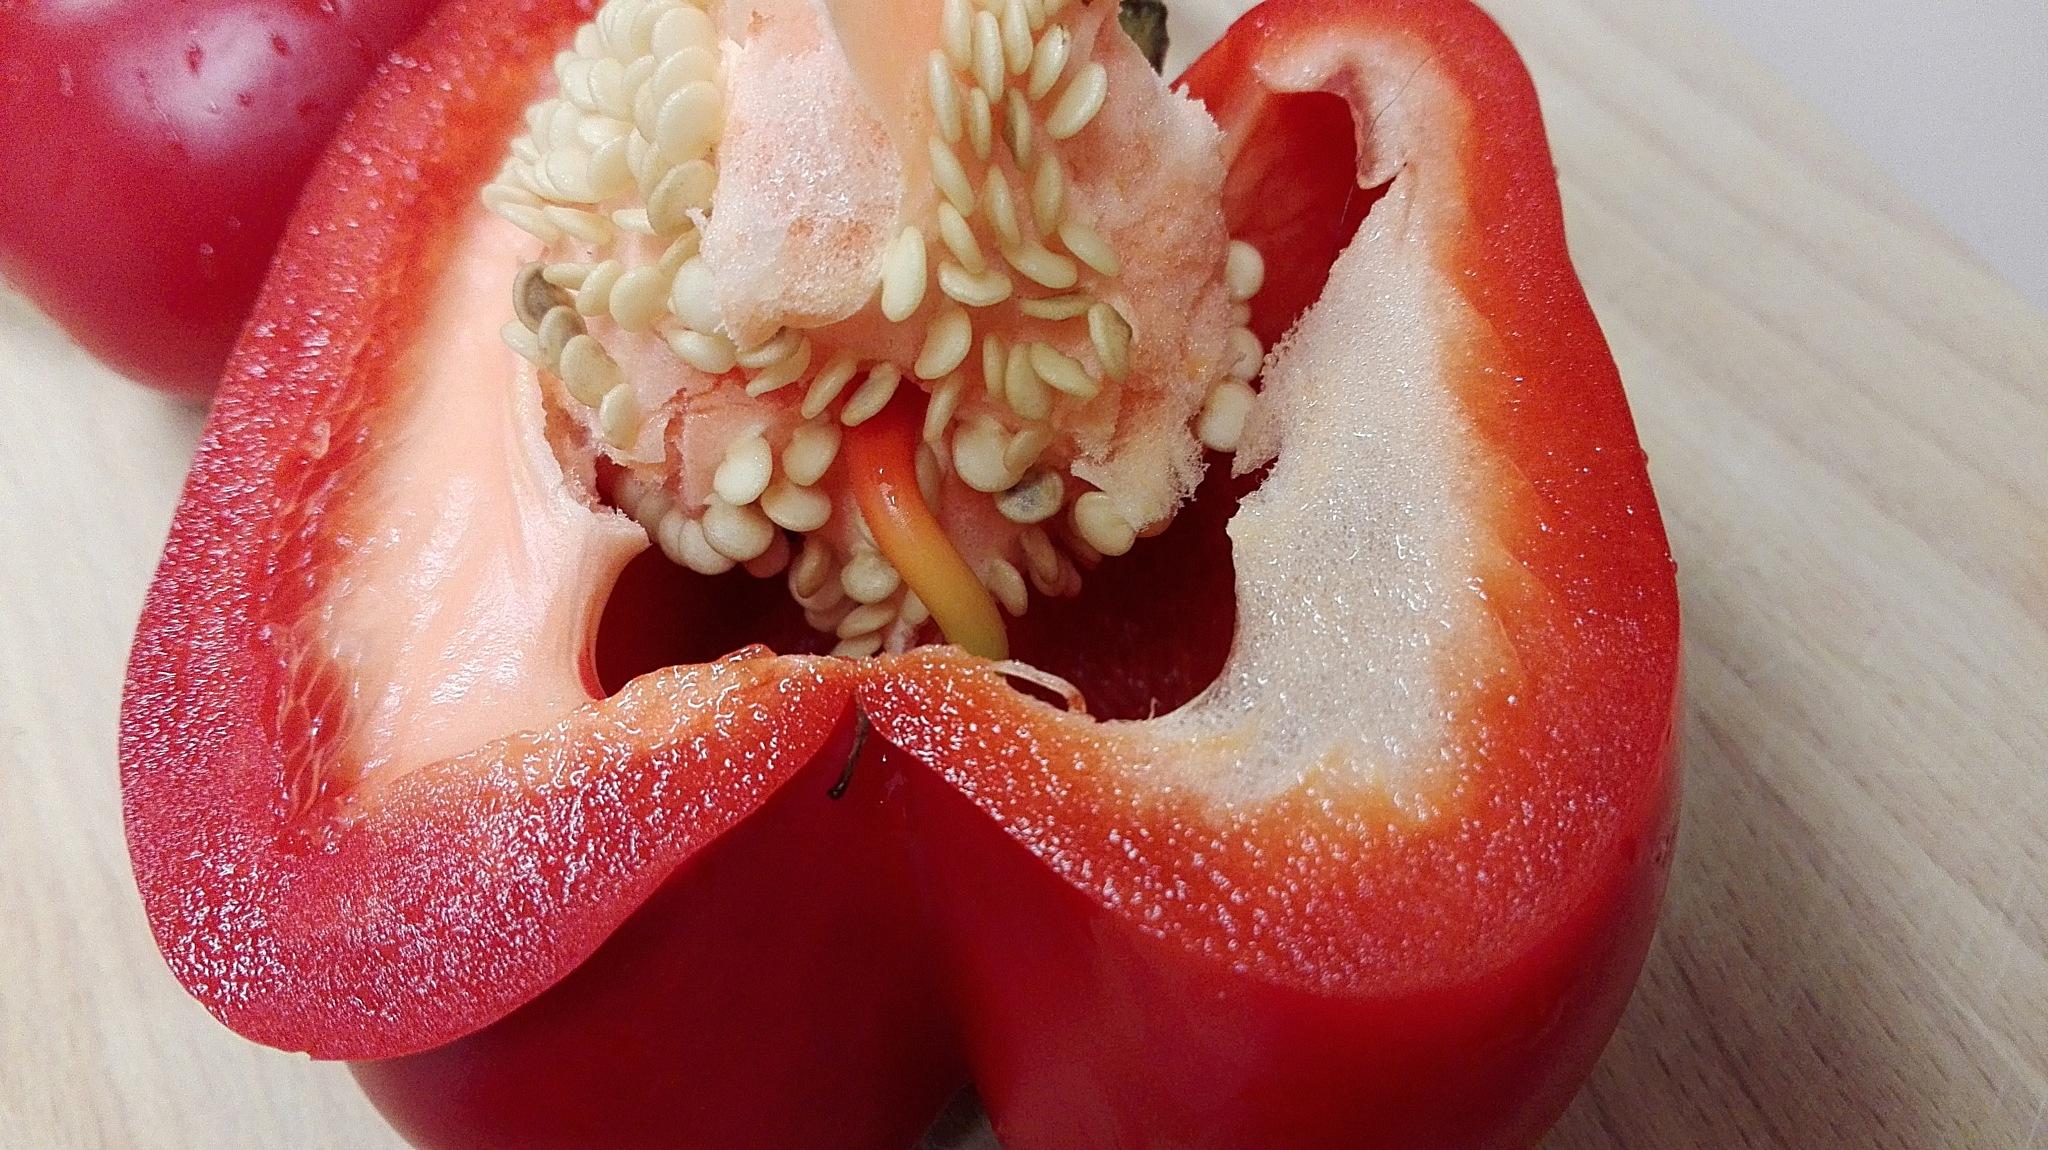 studium papryki II     study peppers II by B Tessa Marcinkowska